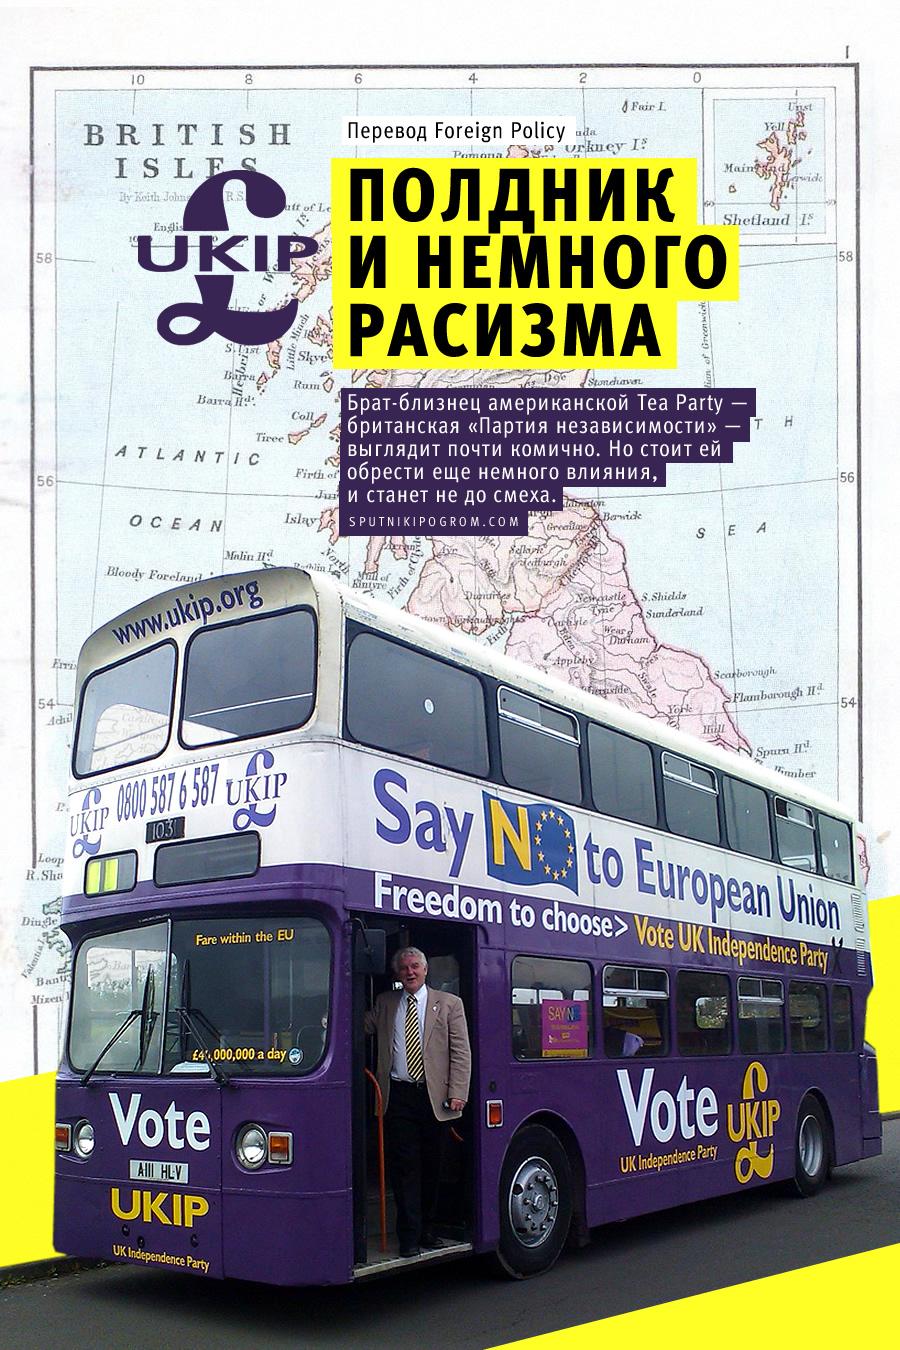 http://sputnikipogrom.com/wp-content/uploads/2014/05/UKIP.jpg